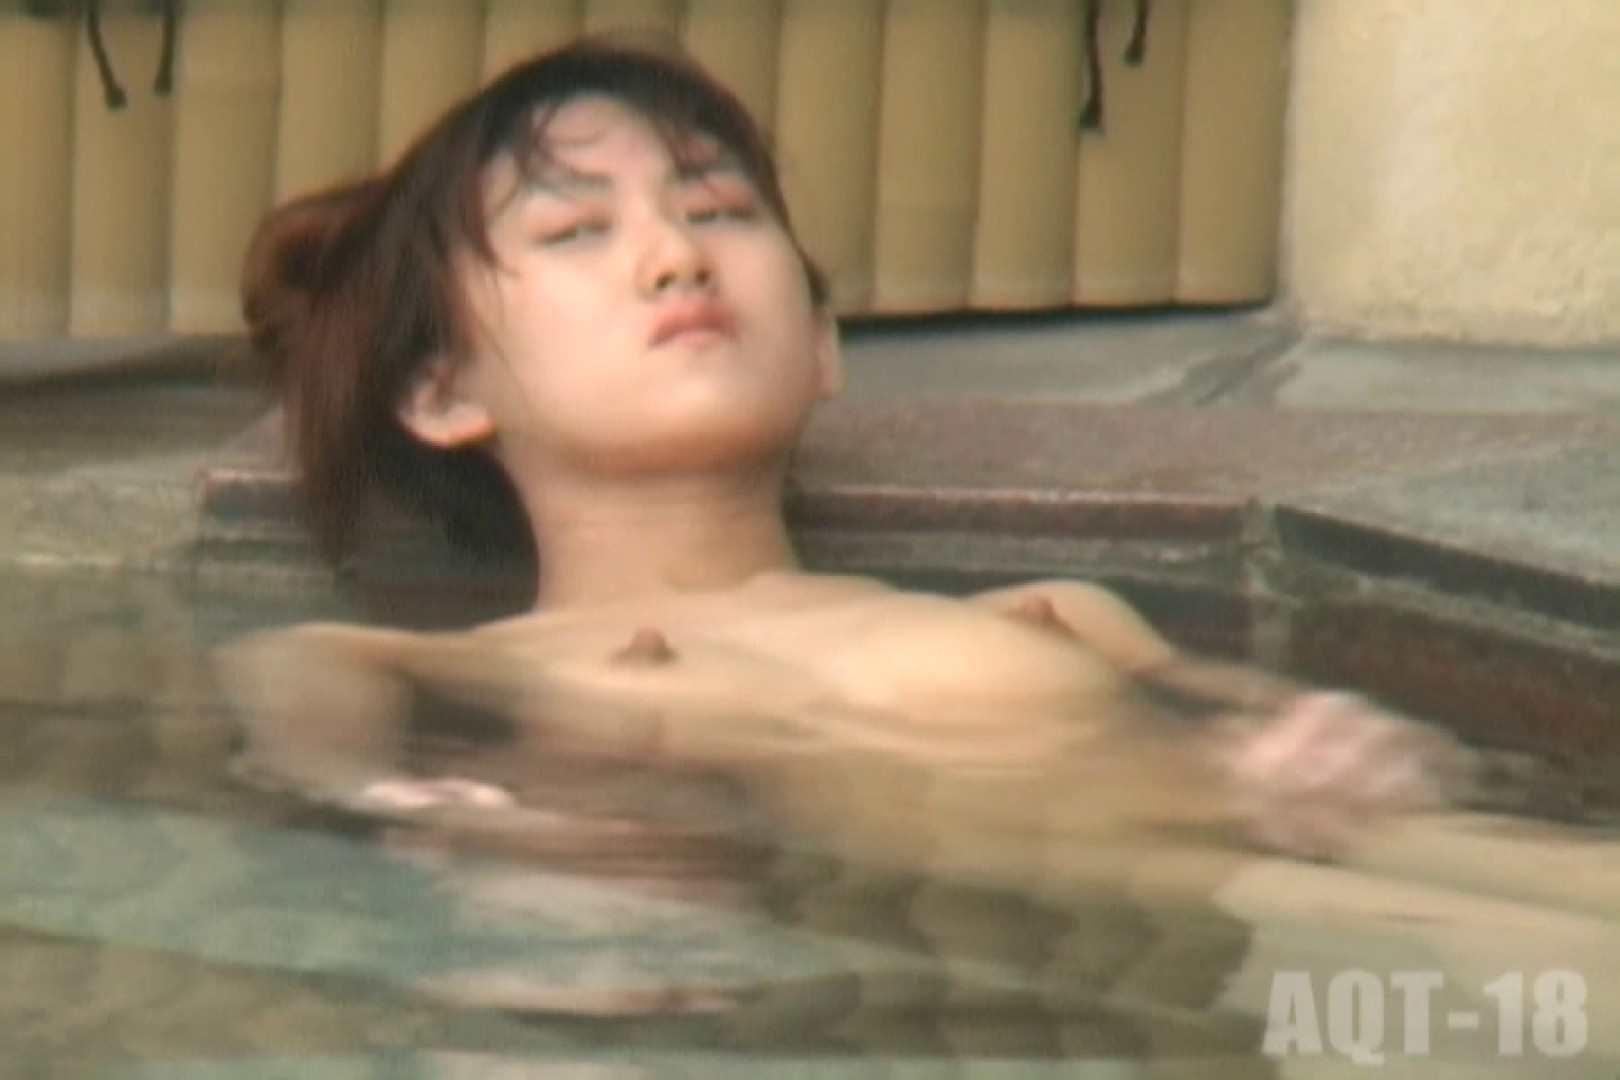 Aquaな露天風呂Vol.862 盗撮 AV無料動画キャプチャ 92PICs 38